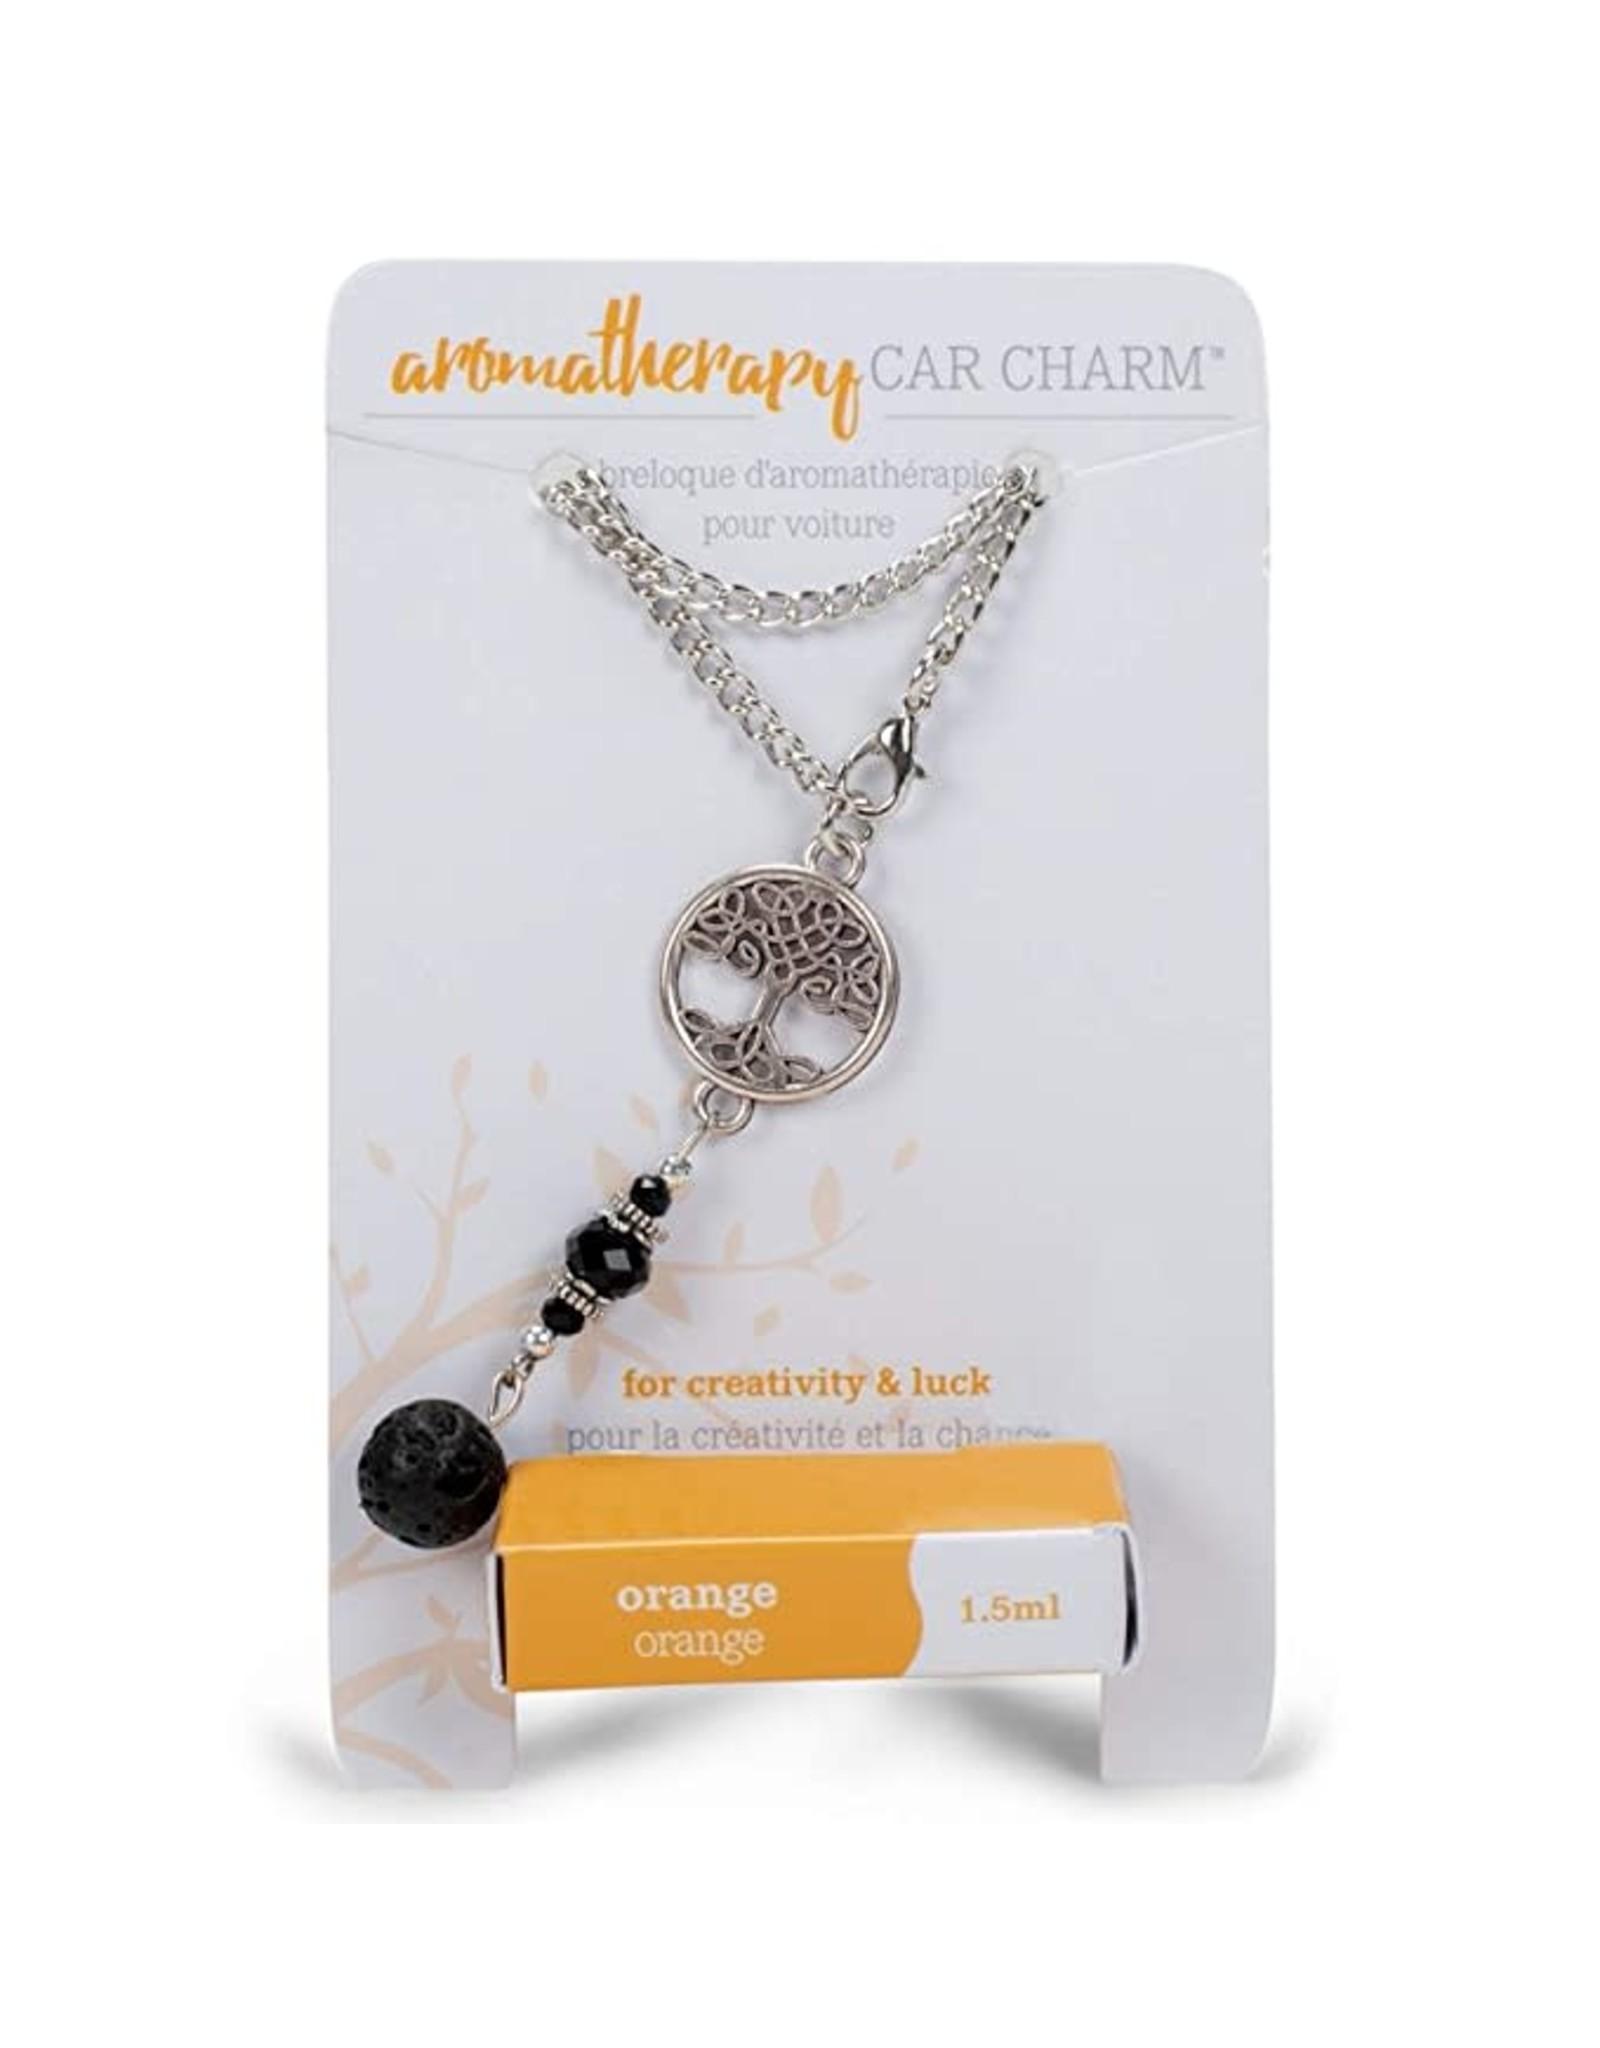 Aromatherapy Car Charm